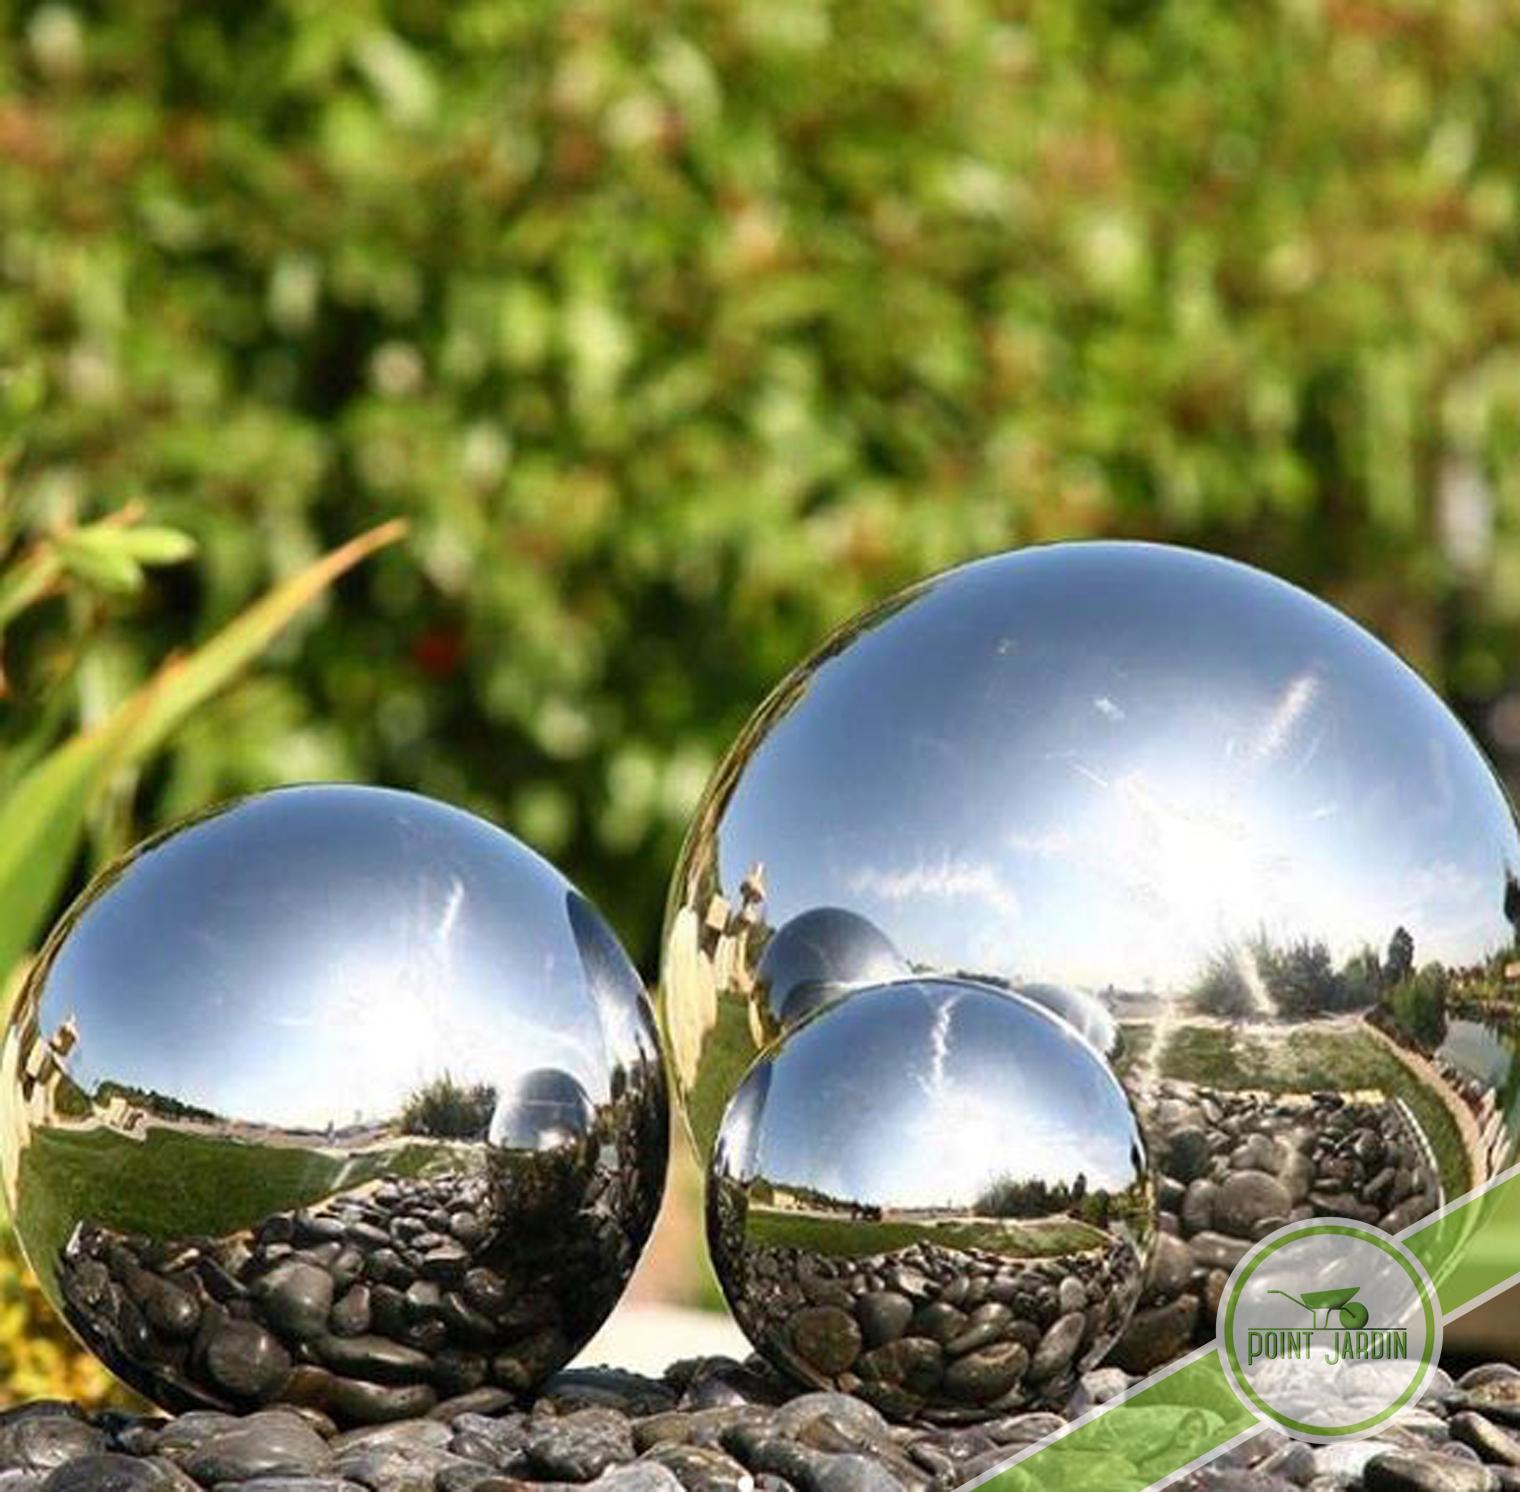 Sphère Inox 50Cm avec Boule Deco Jardin